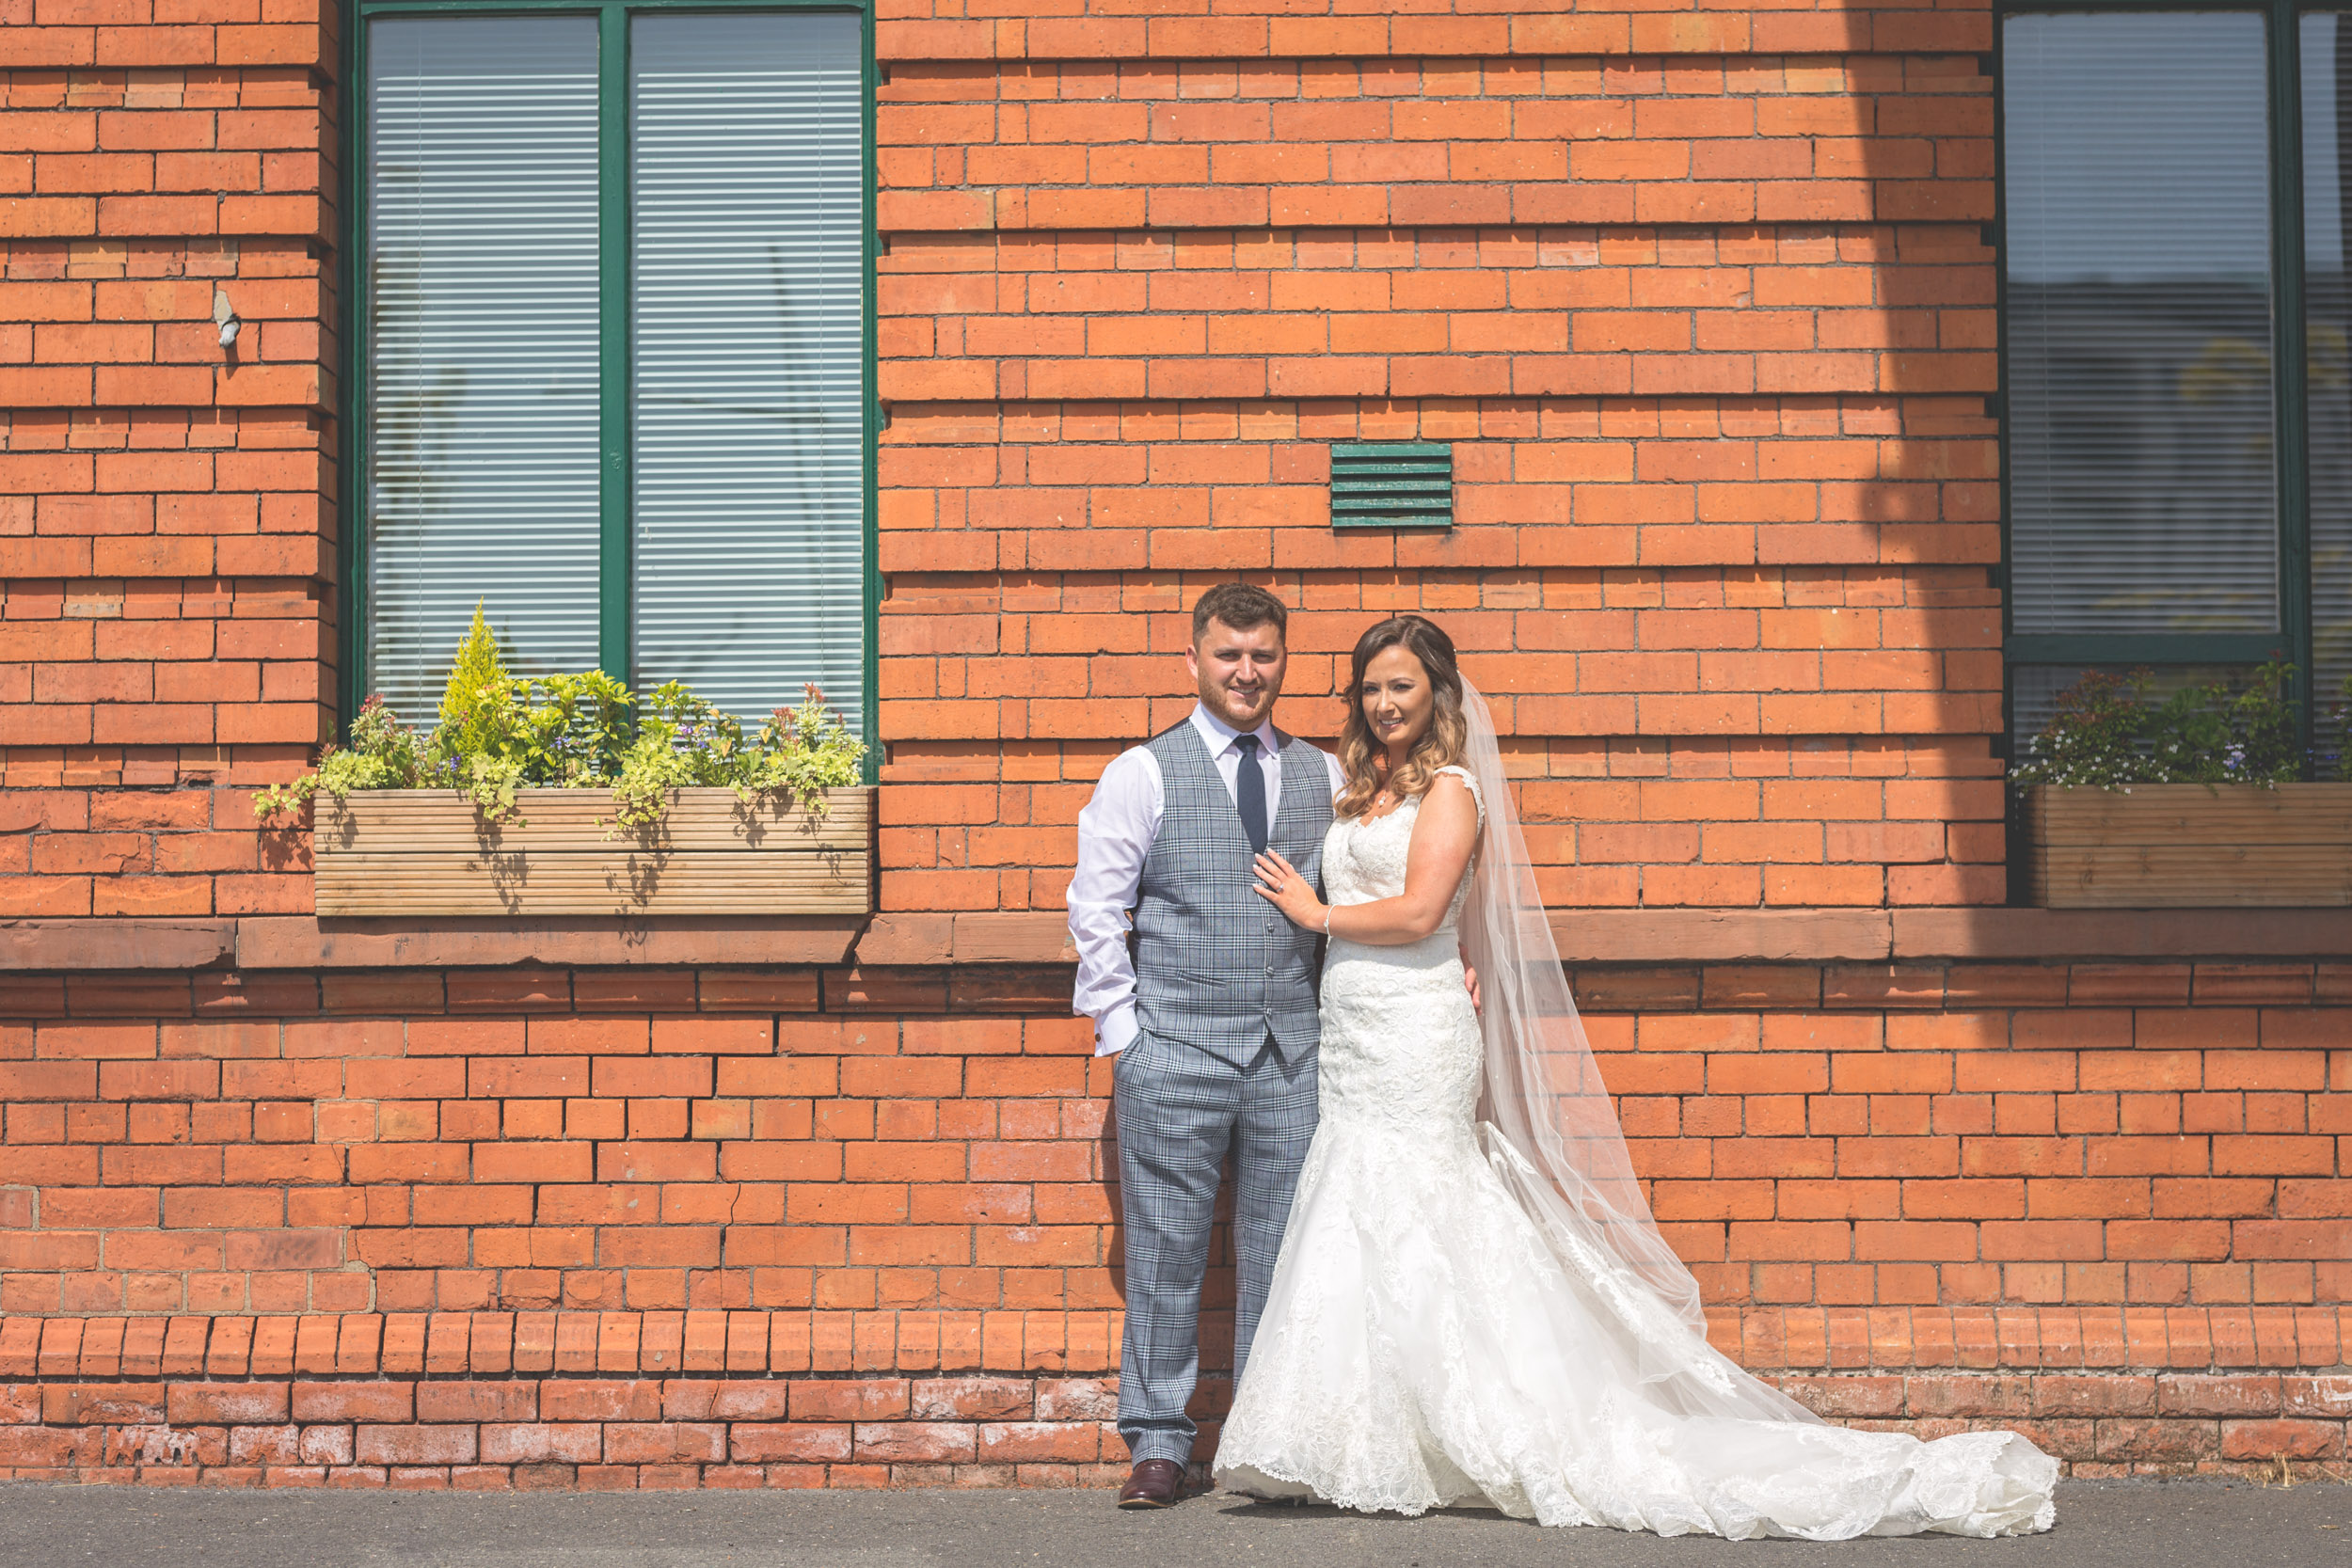 Brian McEwan   Northern Ireland Wedding Photographer   Rebecca & Michael   Portraits-82.jpg